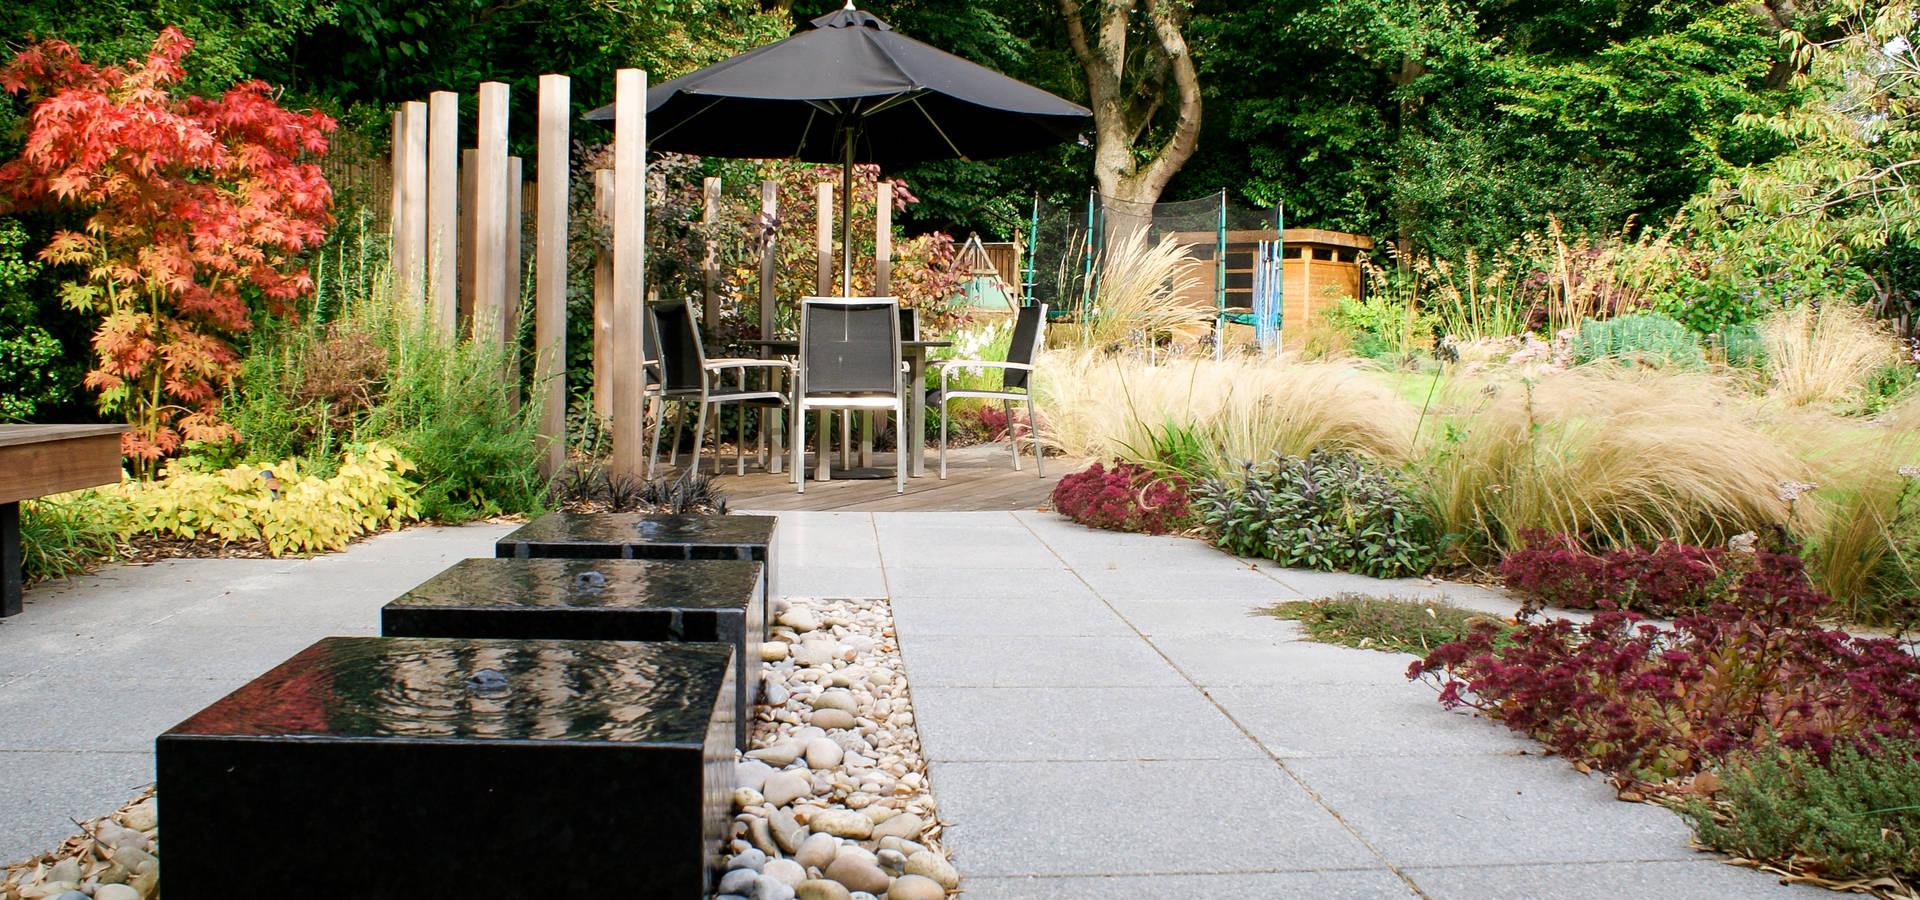 Rosemary Coldstream Garden Design Limited